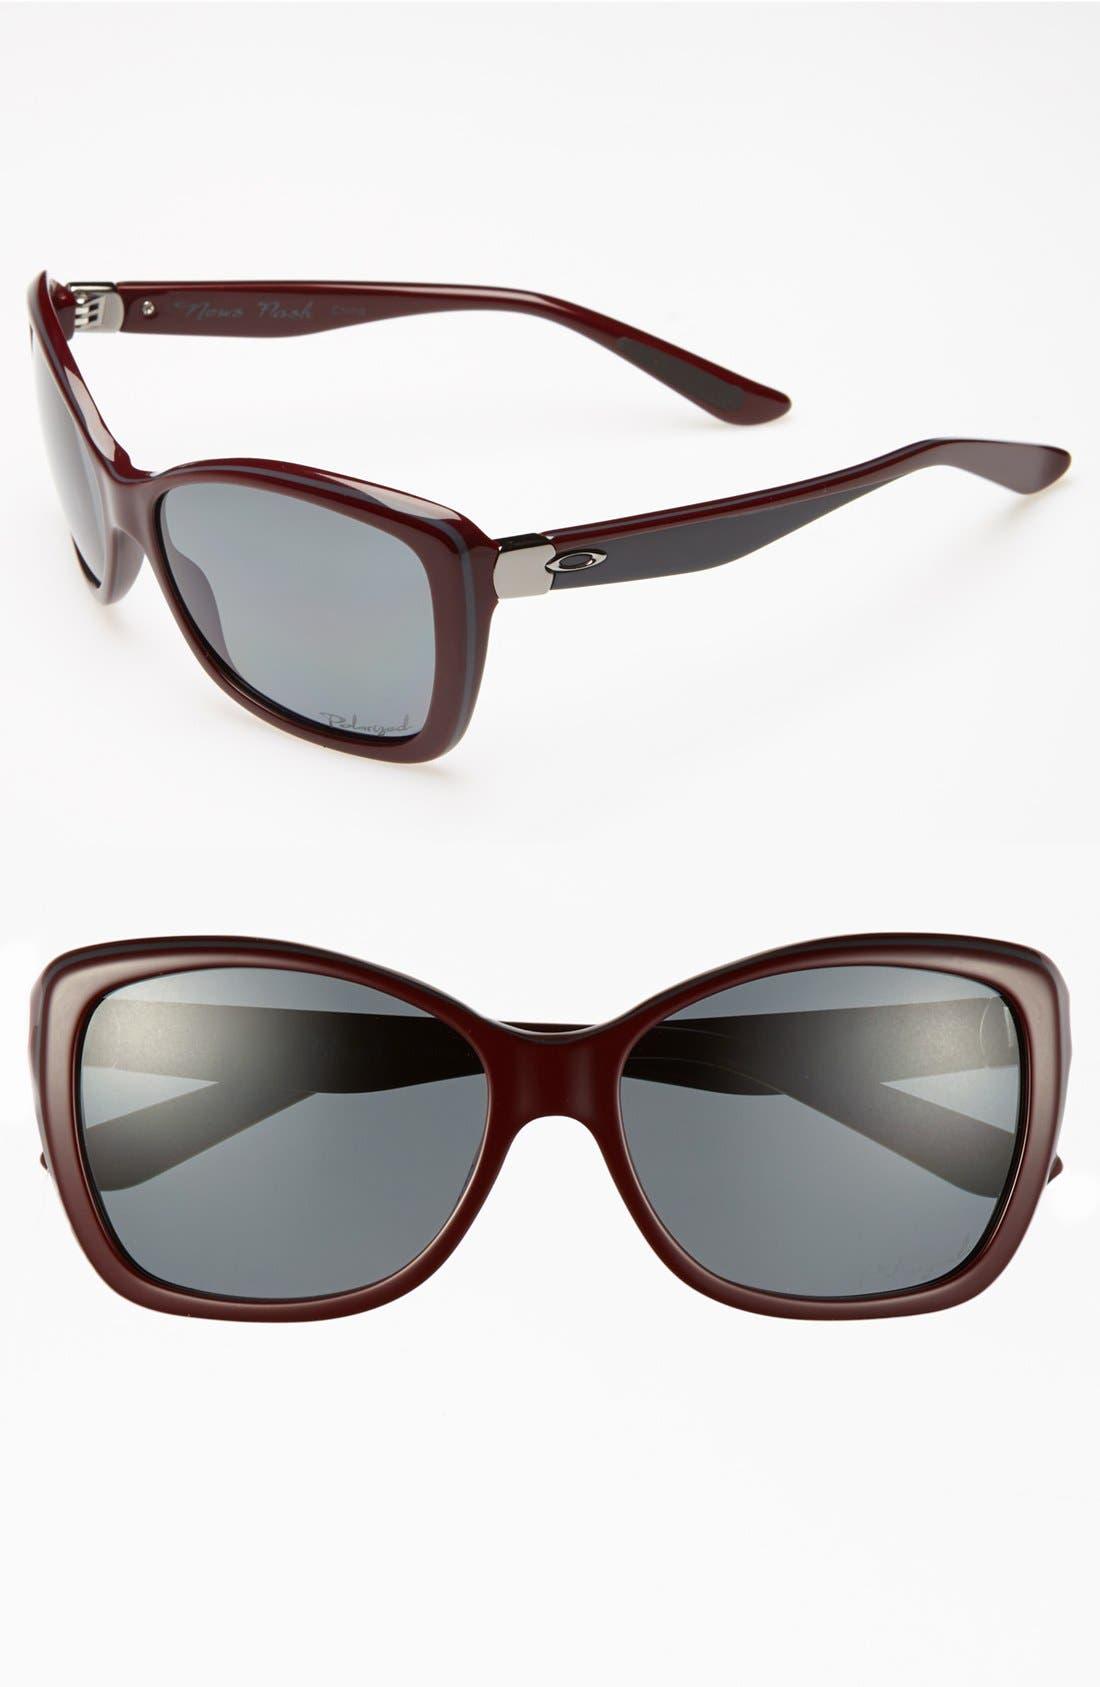 Main Image - Oakley 'News Flash' 56mm Polarized Sunglasses